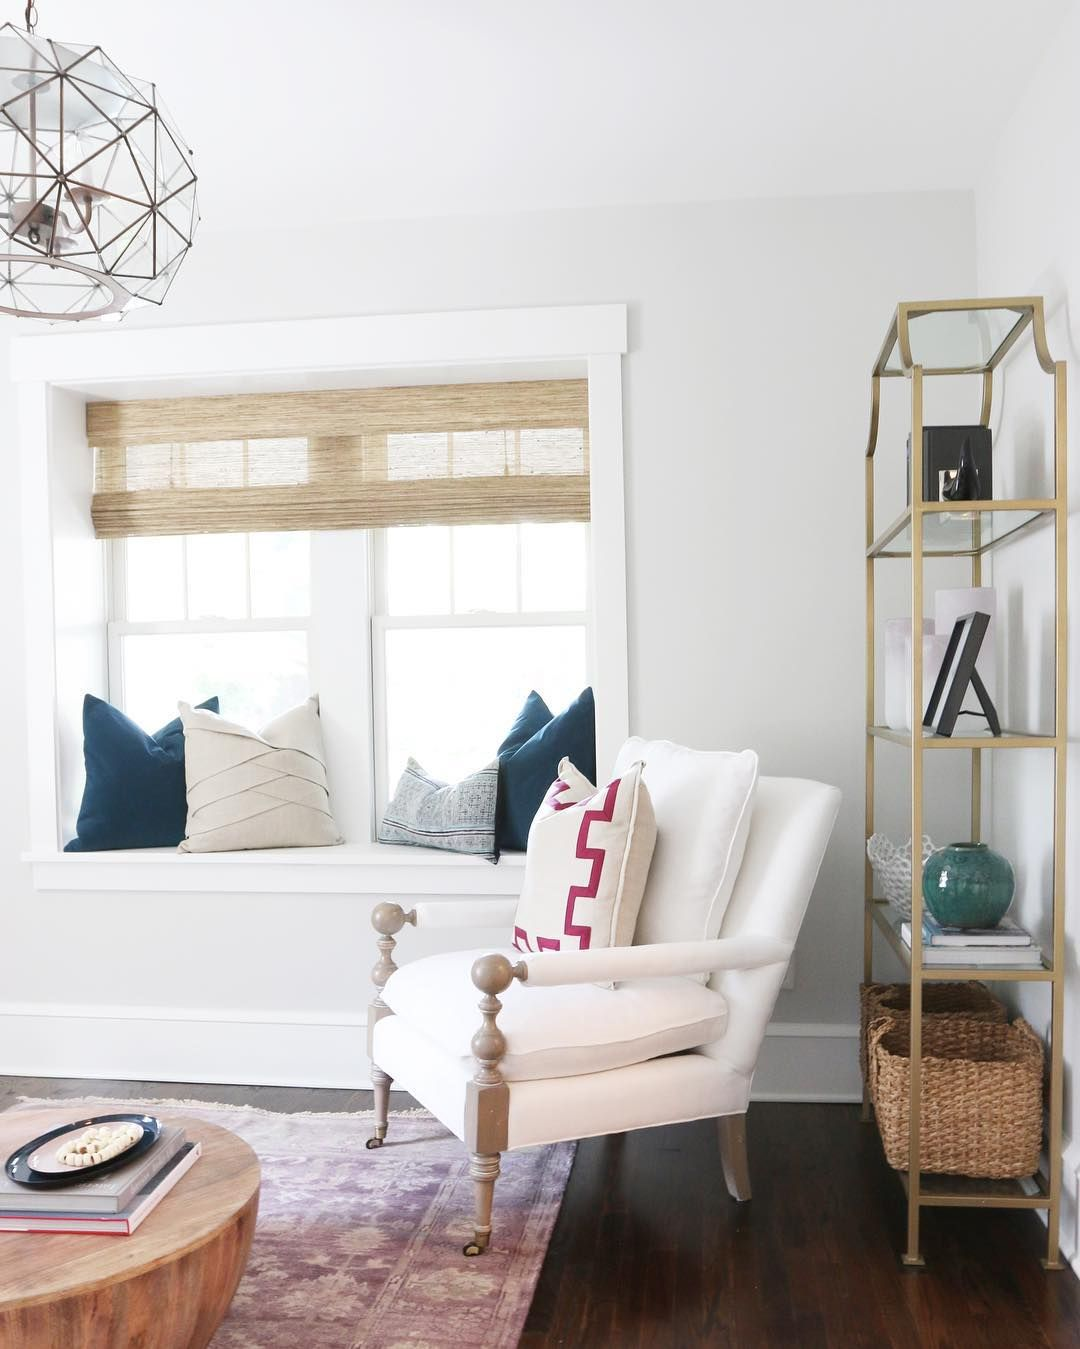 Window Treatments Interiordesign: Living Room Remodel, Minimalist